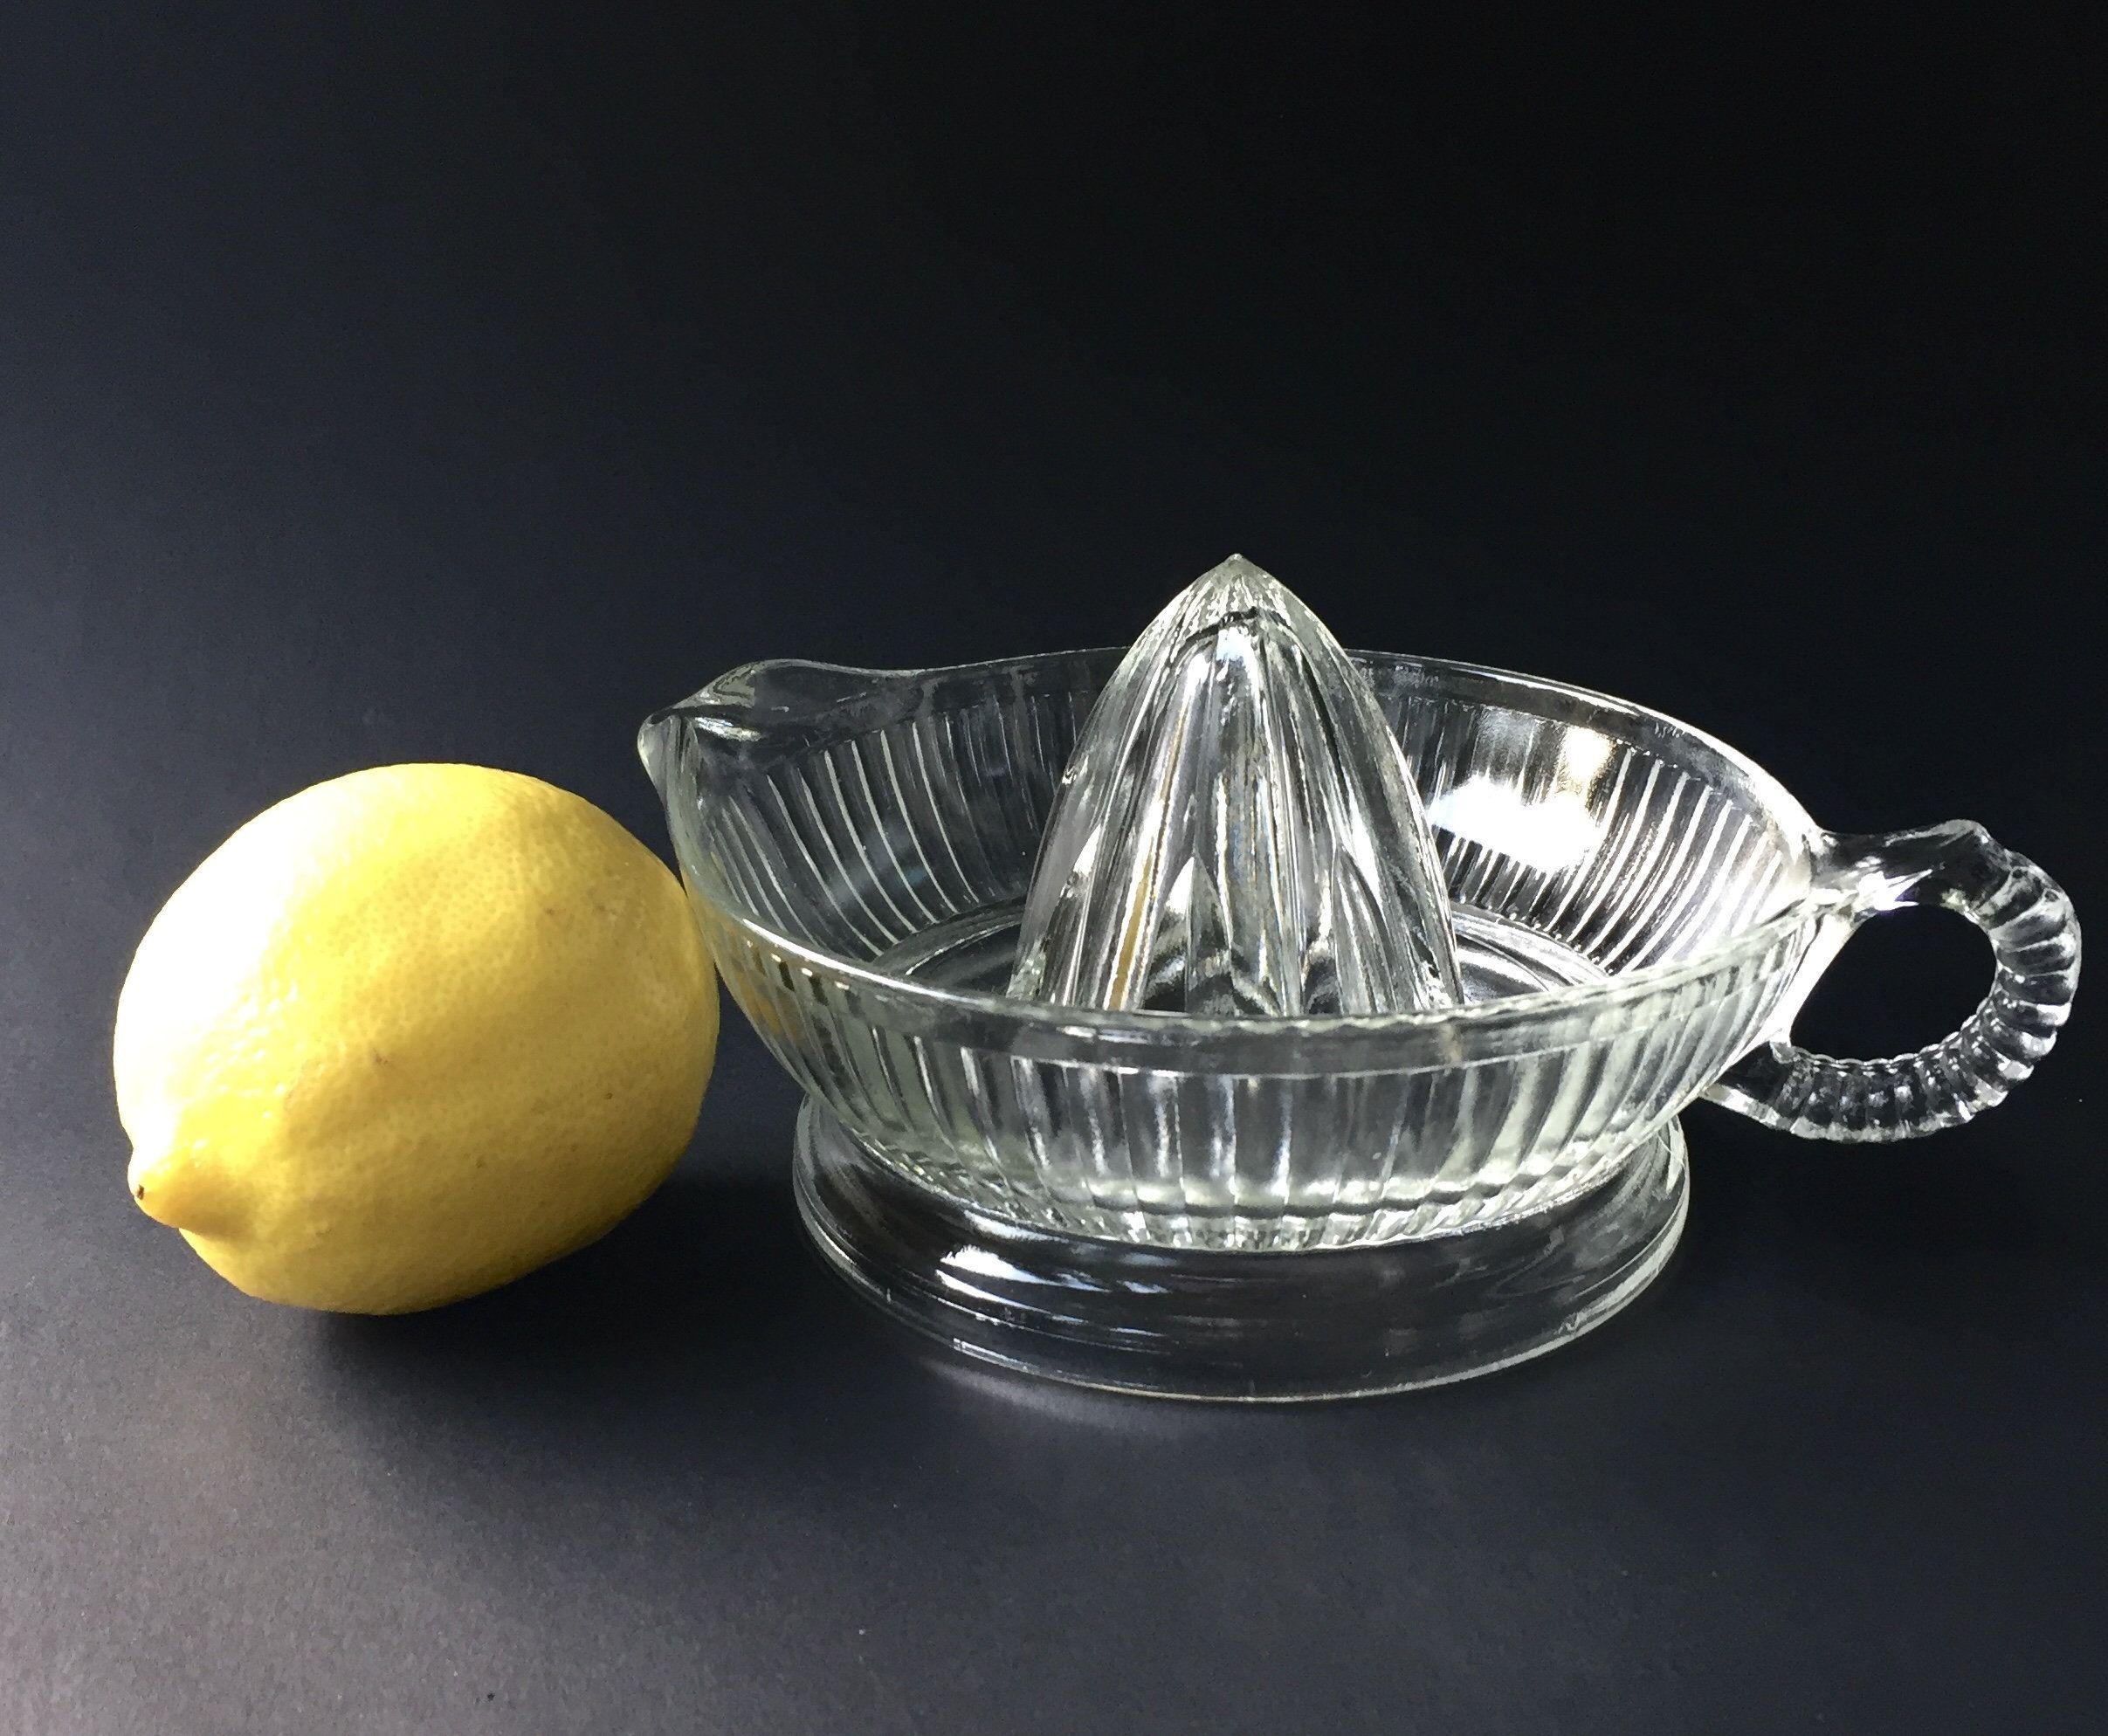 Large Vintage Glass Lemon Juicer Lemon Reamer Citrus Retro Kitchen Glassware Lemon Juicer Juicer Retro Kitchen